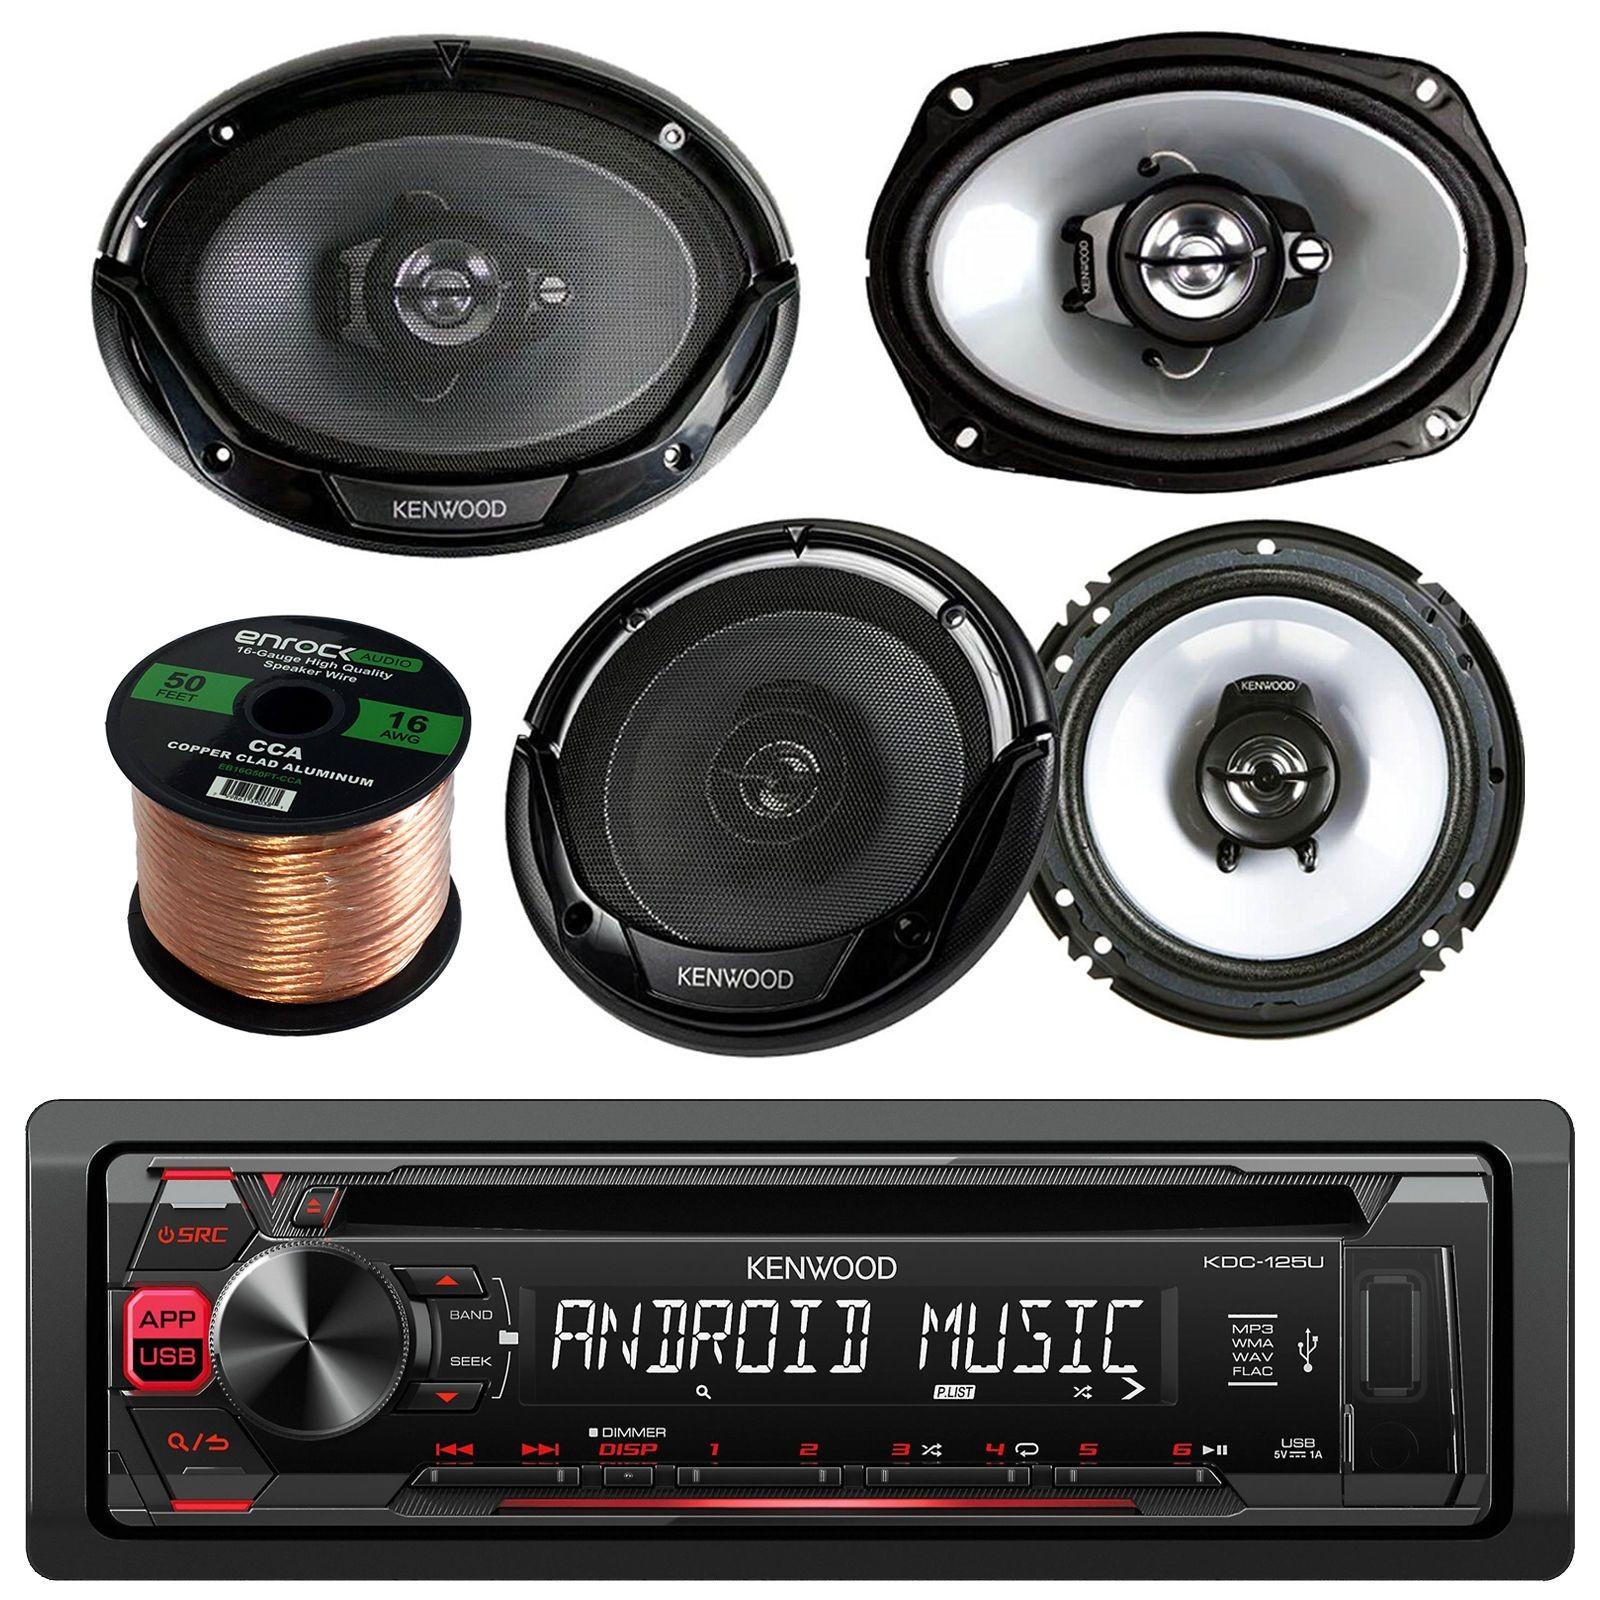 Kenwood Car CD MP3 AM FM AUX USB Receiver & Remote 2 X 6 5 2 X 69 Speakers